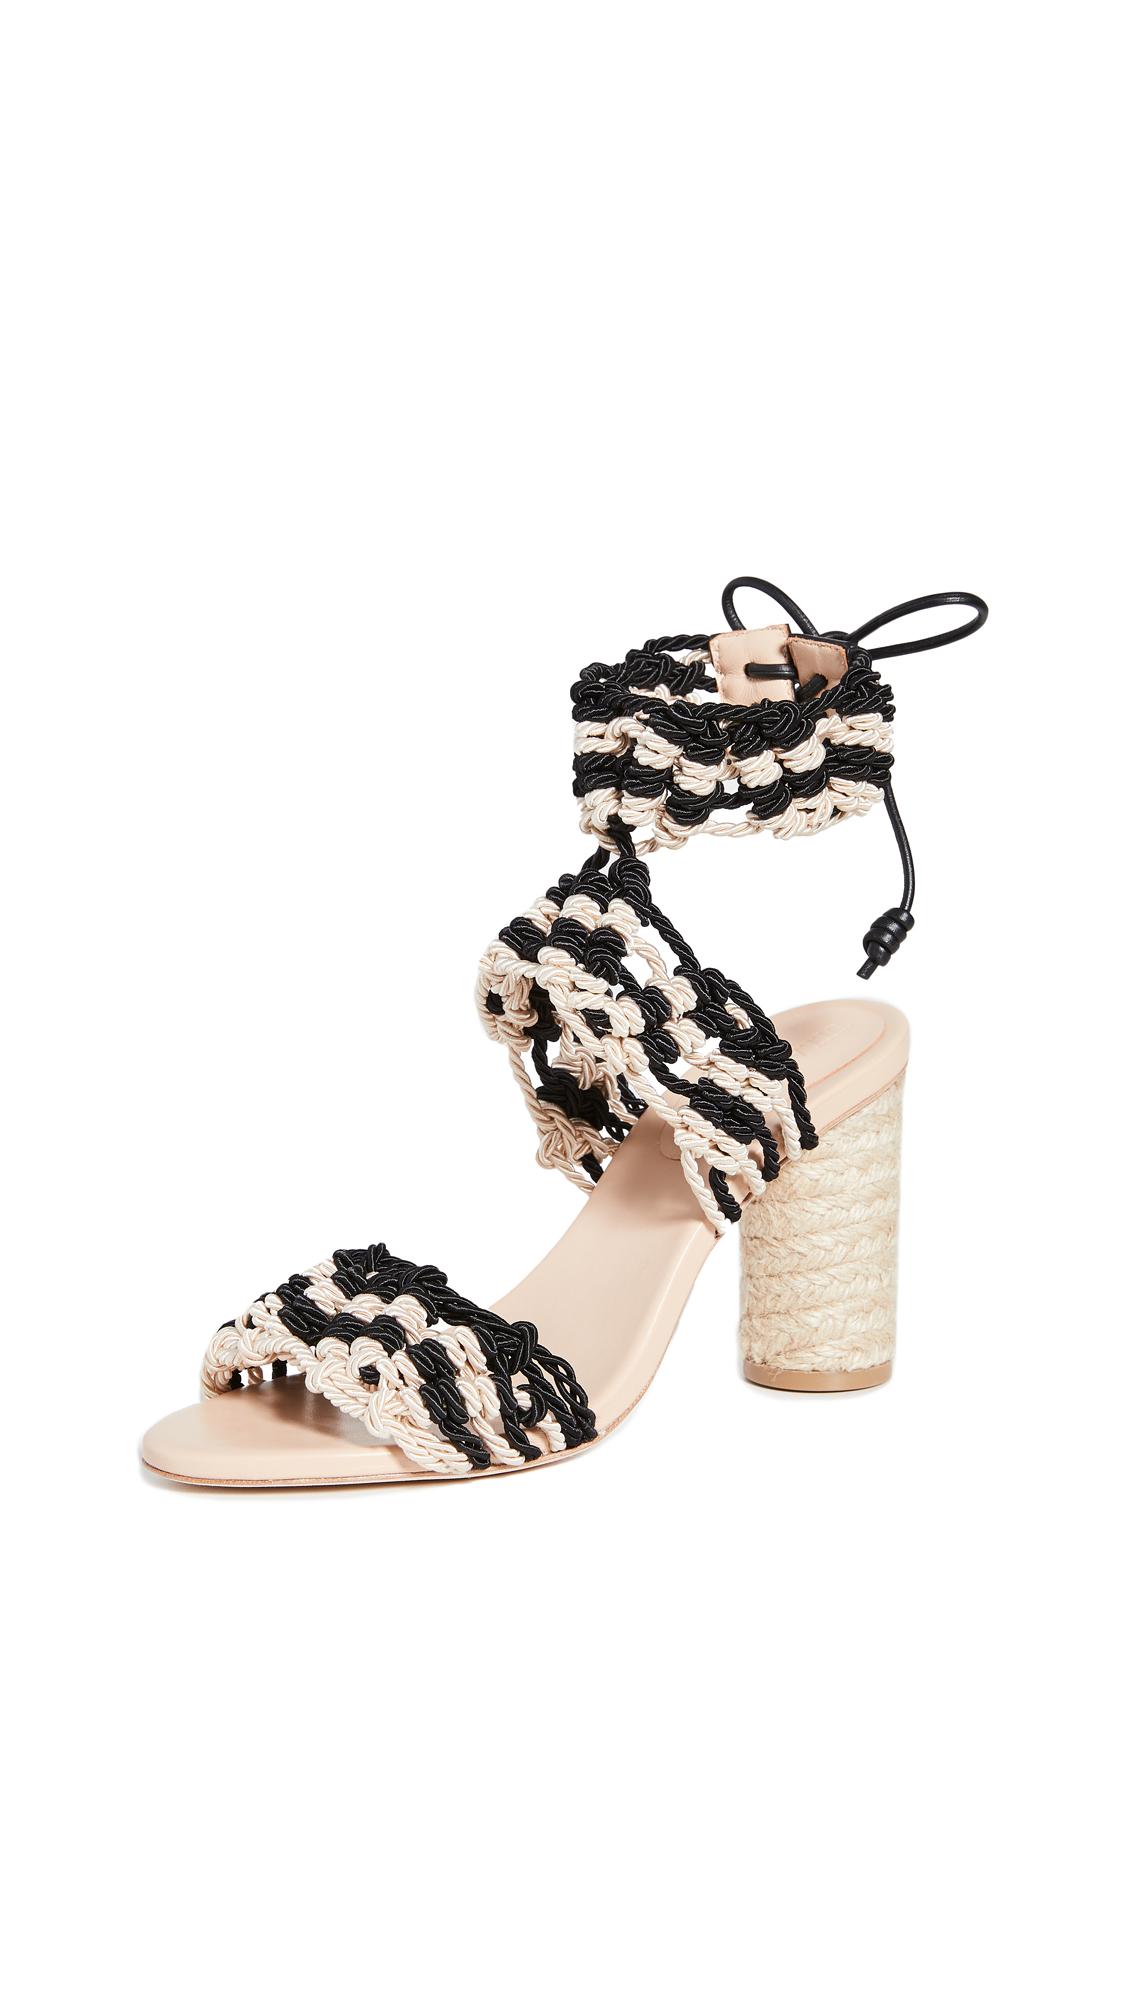 Ulla Johnson Devra Heel Sandals - 30% Off Sale